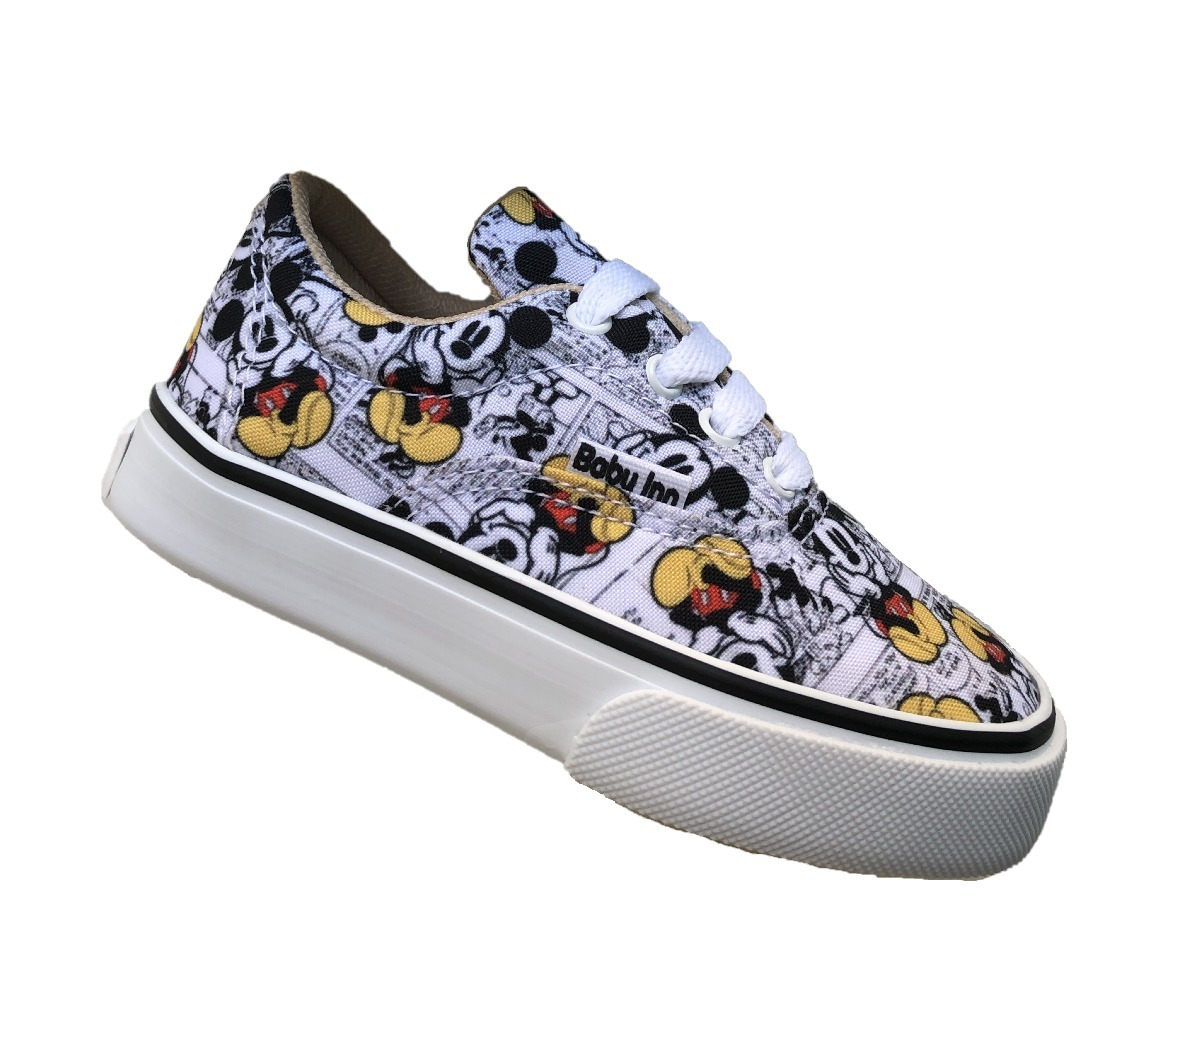 Tenis bebe niño mickey mouse estilo vans en mercado libre jpg 1200x1051  Micky mouse tennis acf400510c9